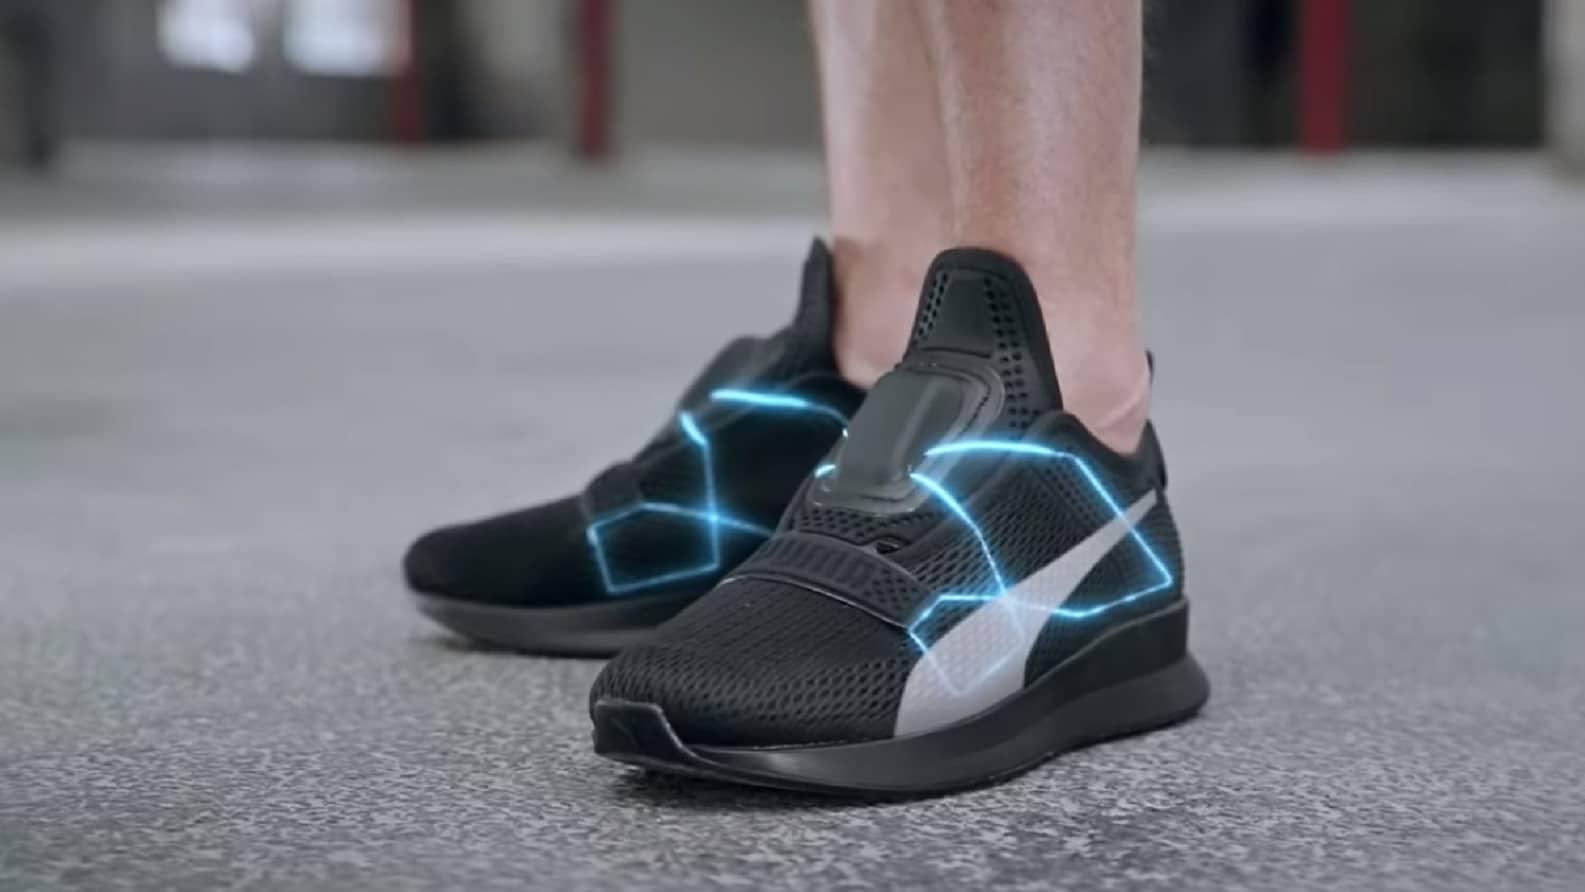 puma self-lacing shoes